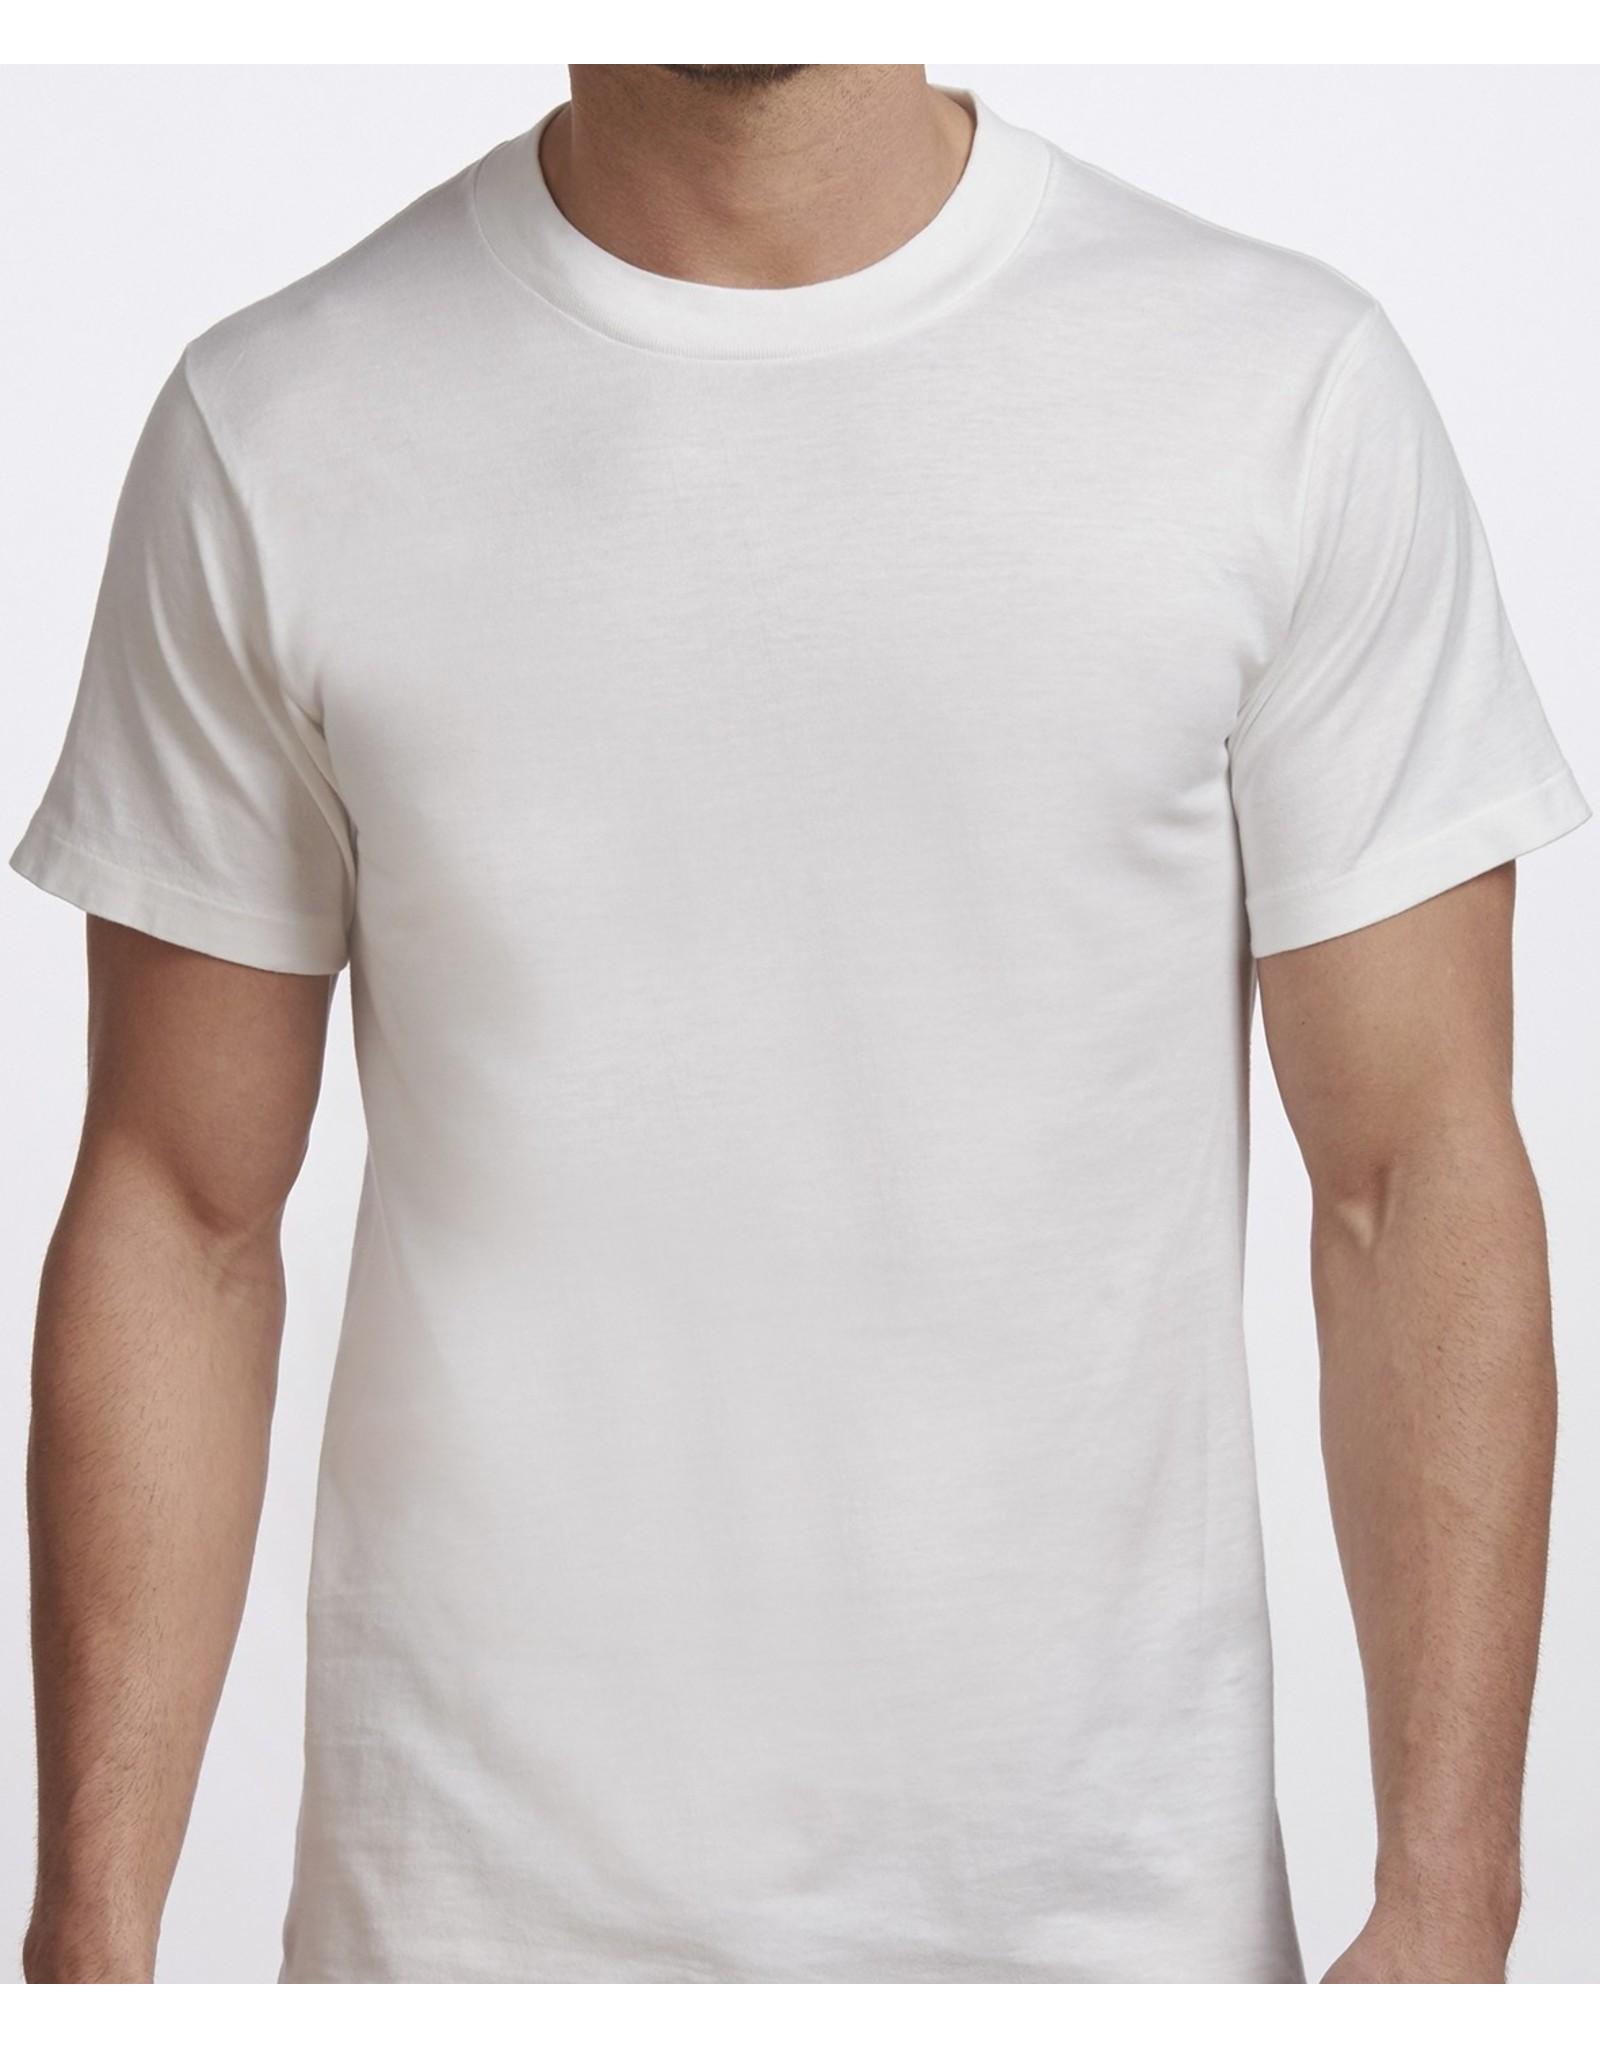 Stanfields Stanfield's 2572 2-Pack Crewneck T-Shirt